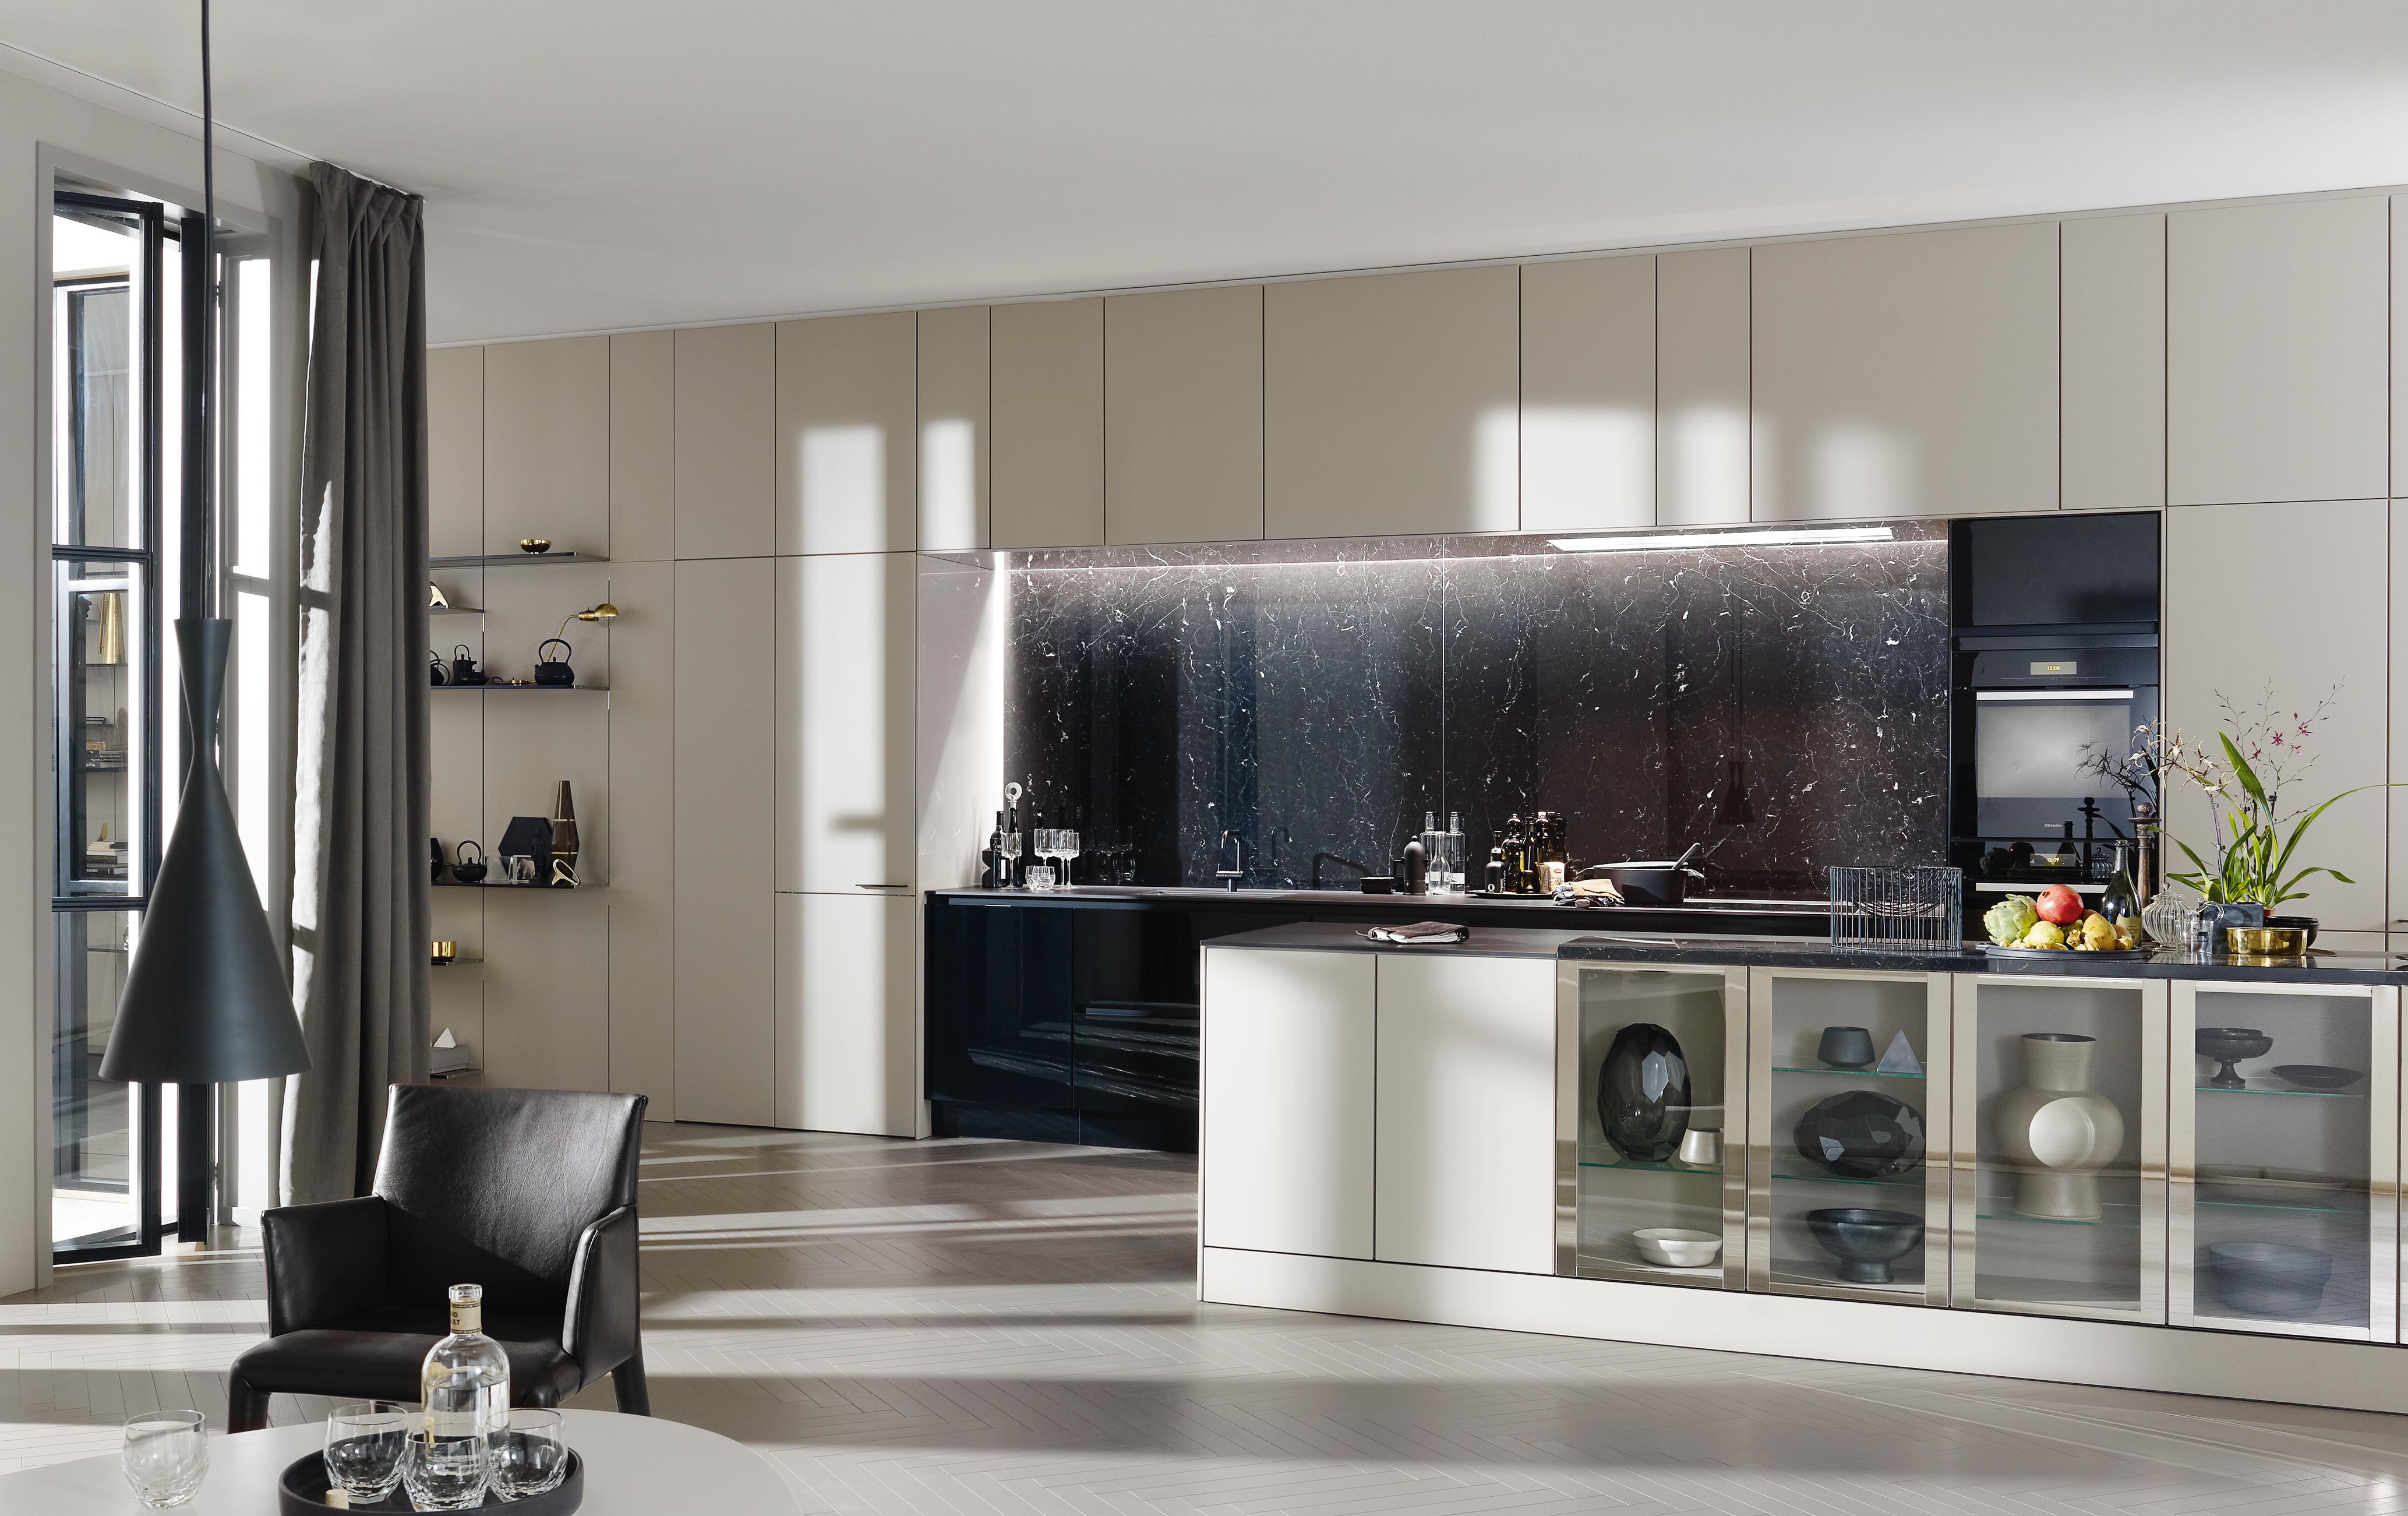 Beautiful Kitchen Design (Image 1 of 10)